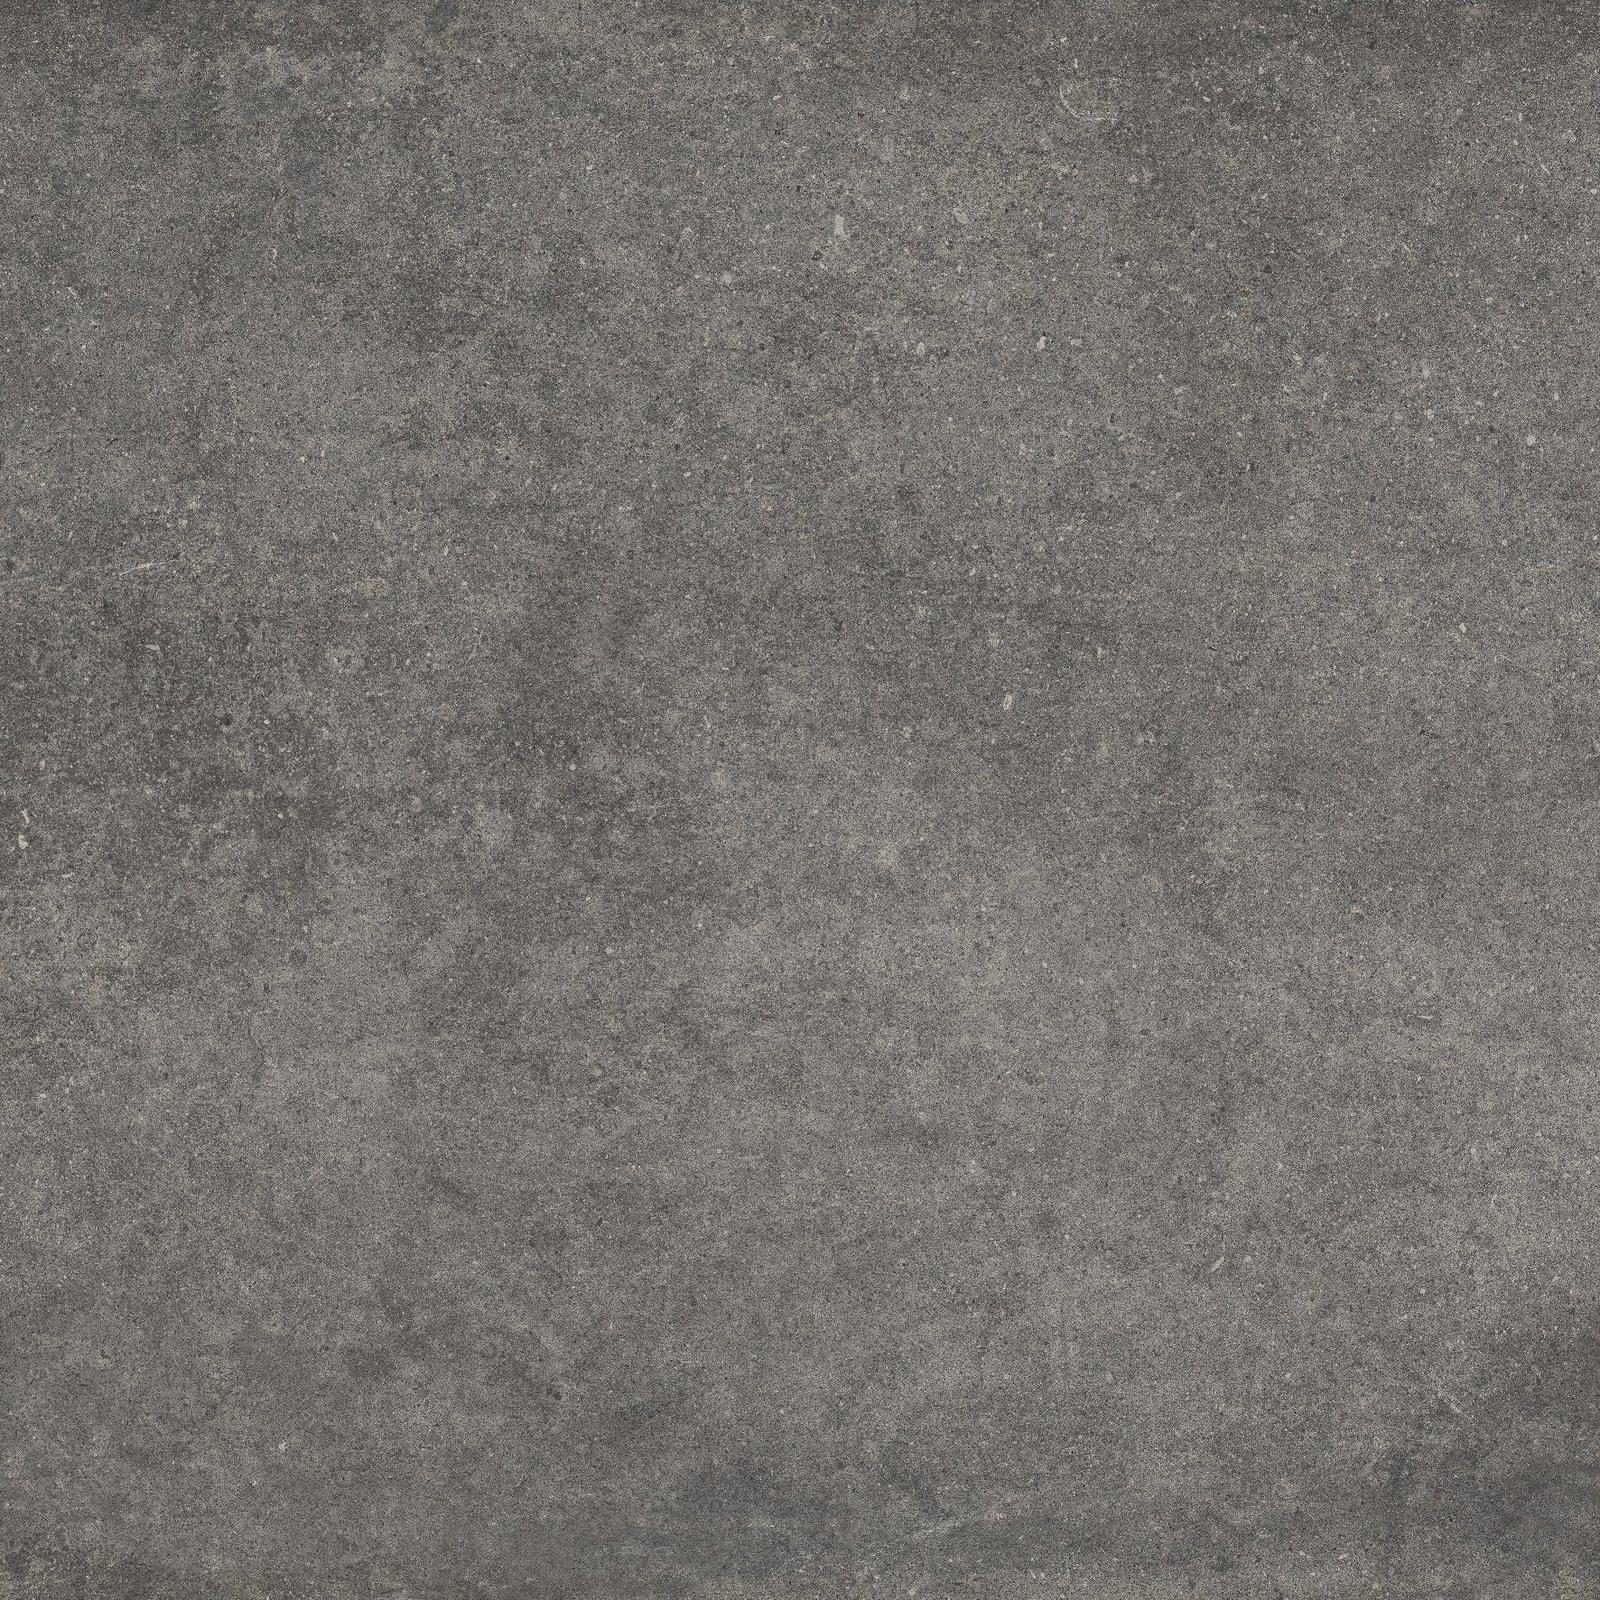 Плитка BLACK (X60RM9R) изображение 1